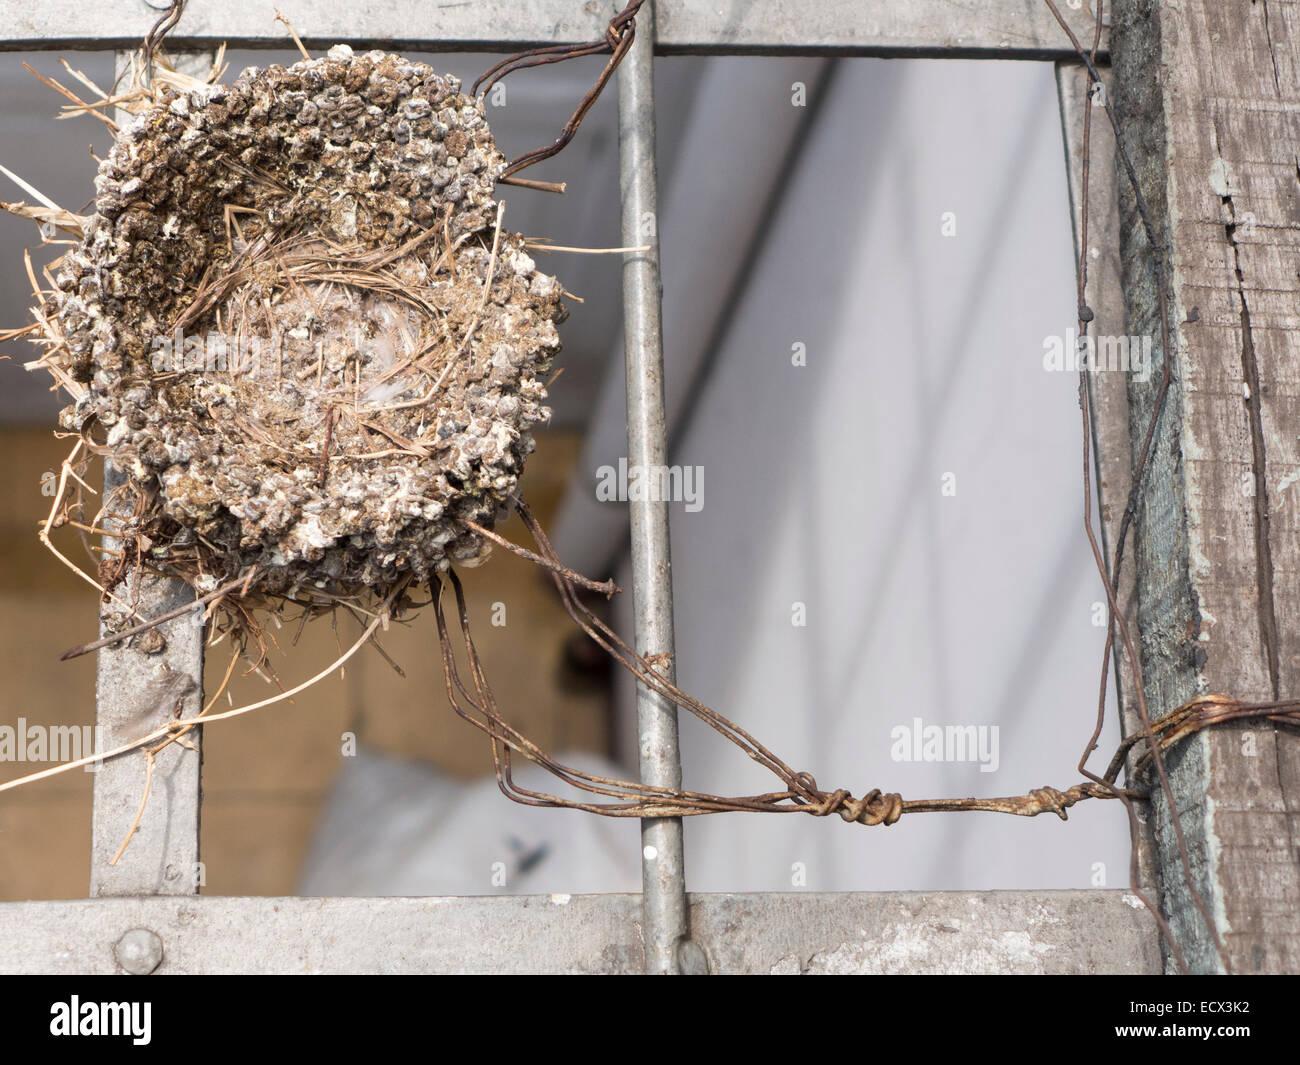 Nido Di Tortore Sul Balcone wire nest stock photos & wire nest stock images - alamy